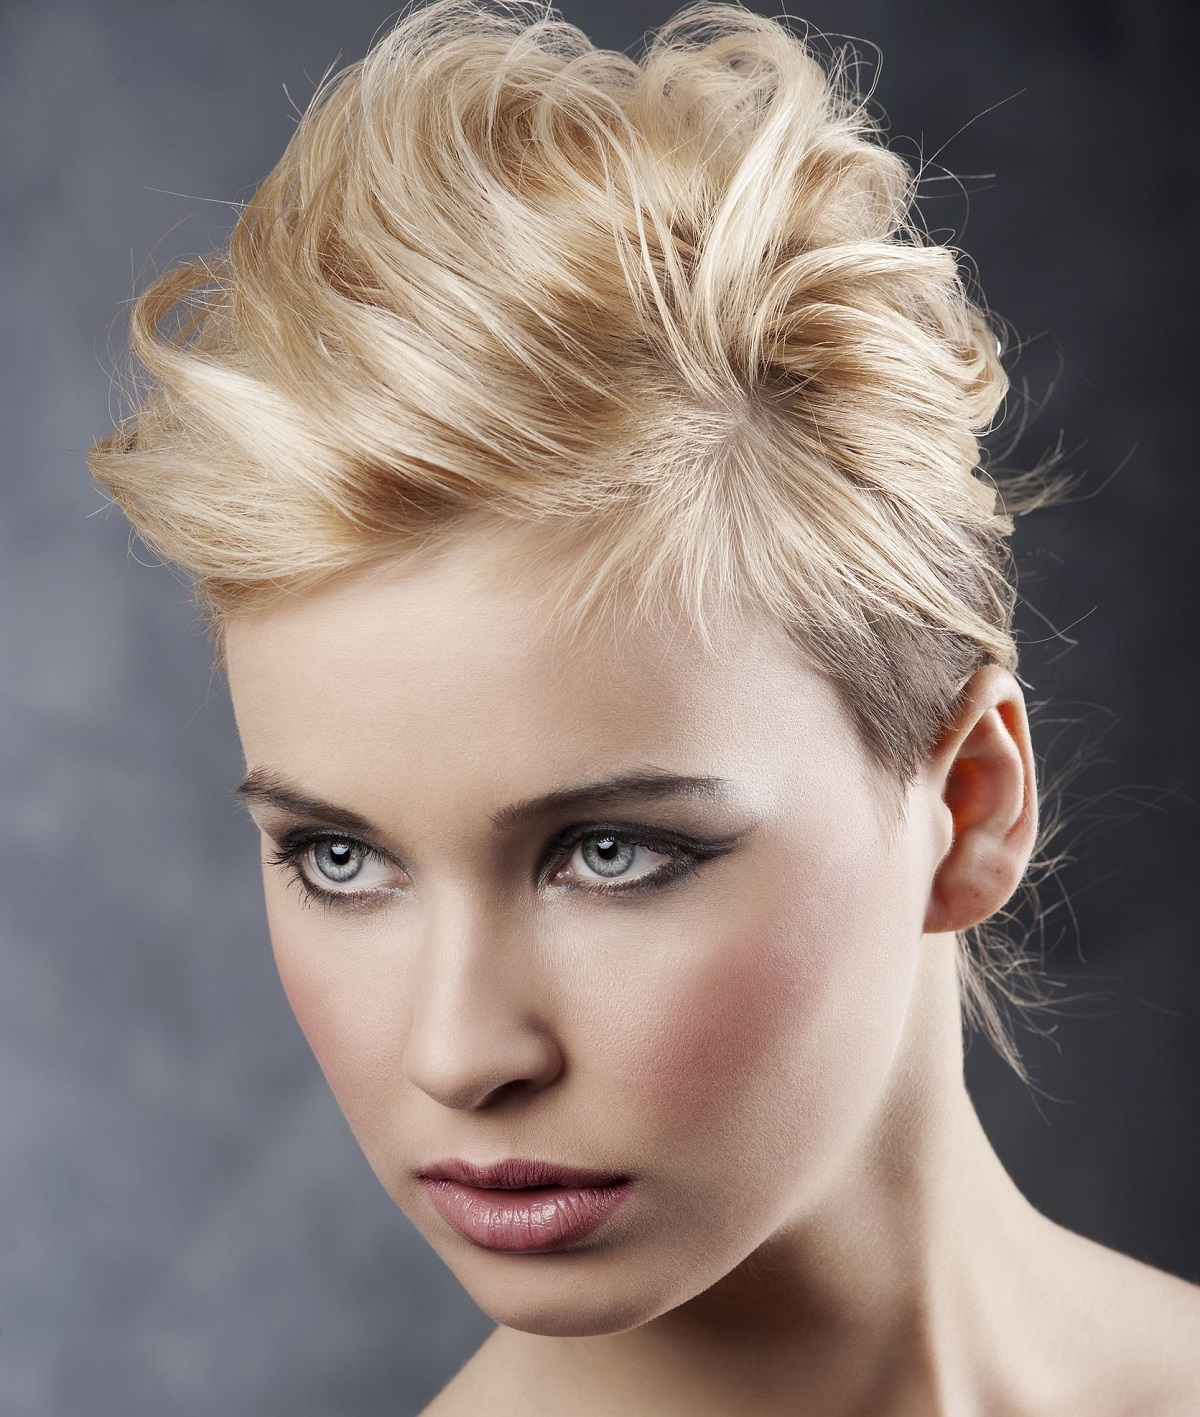 Blond Hair Style